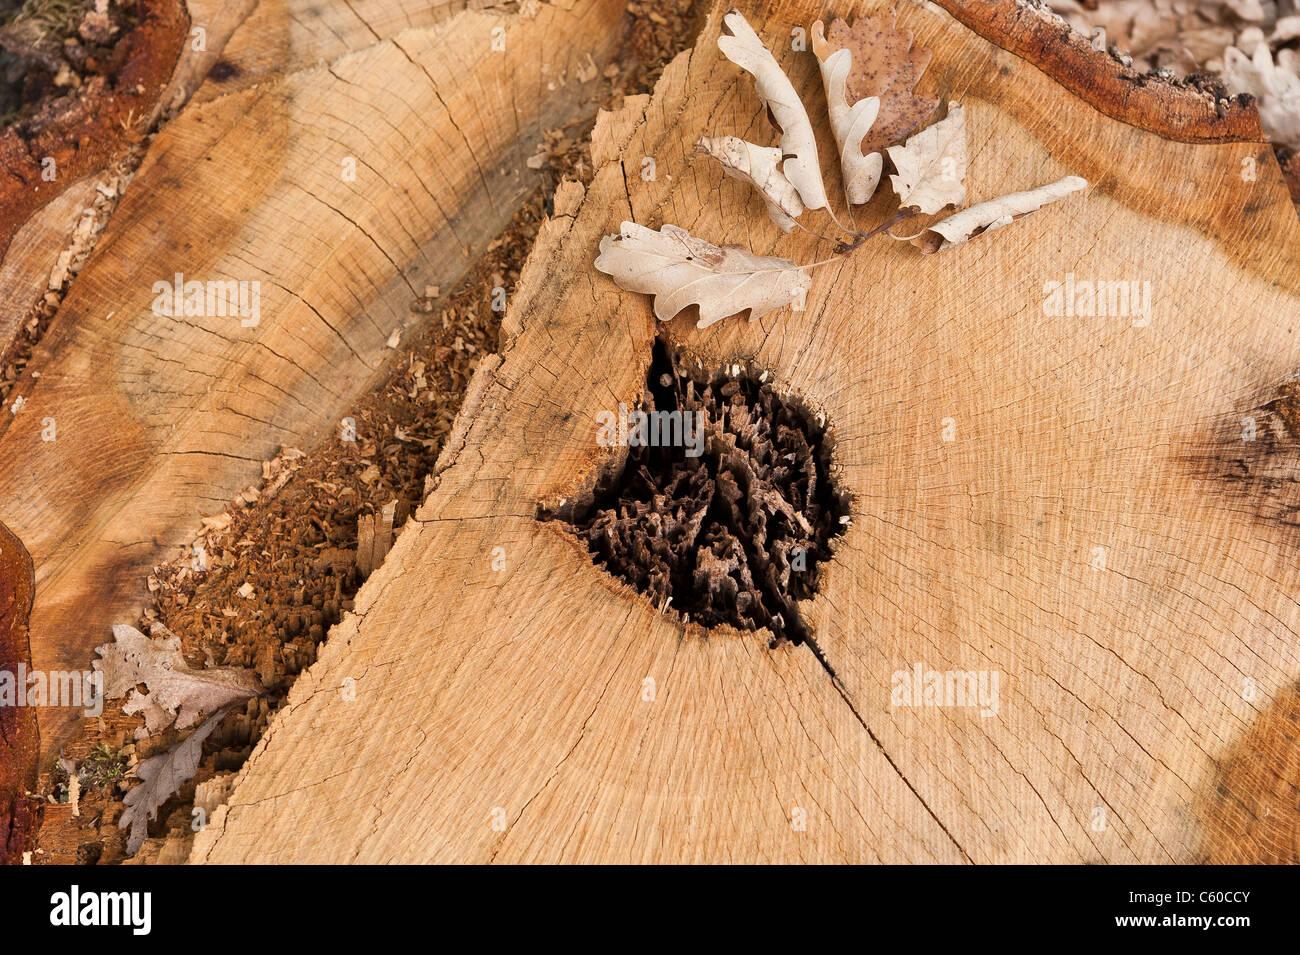 A stump of diseased of oak tree cut down - Stock Image